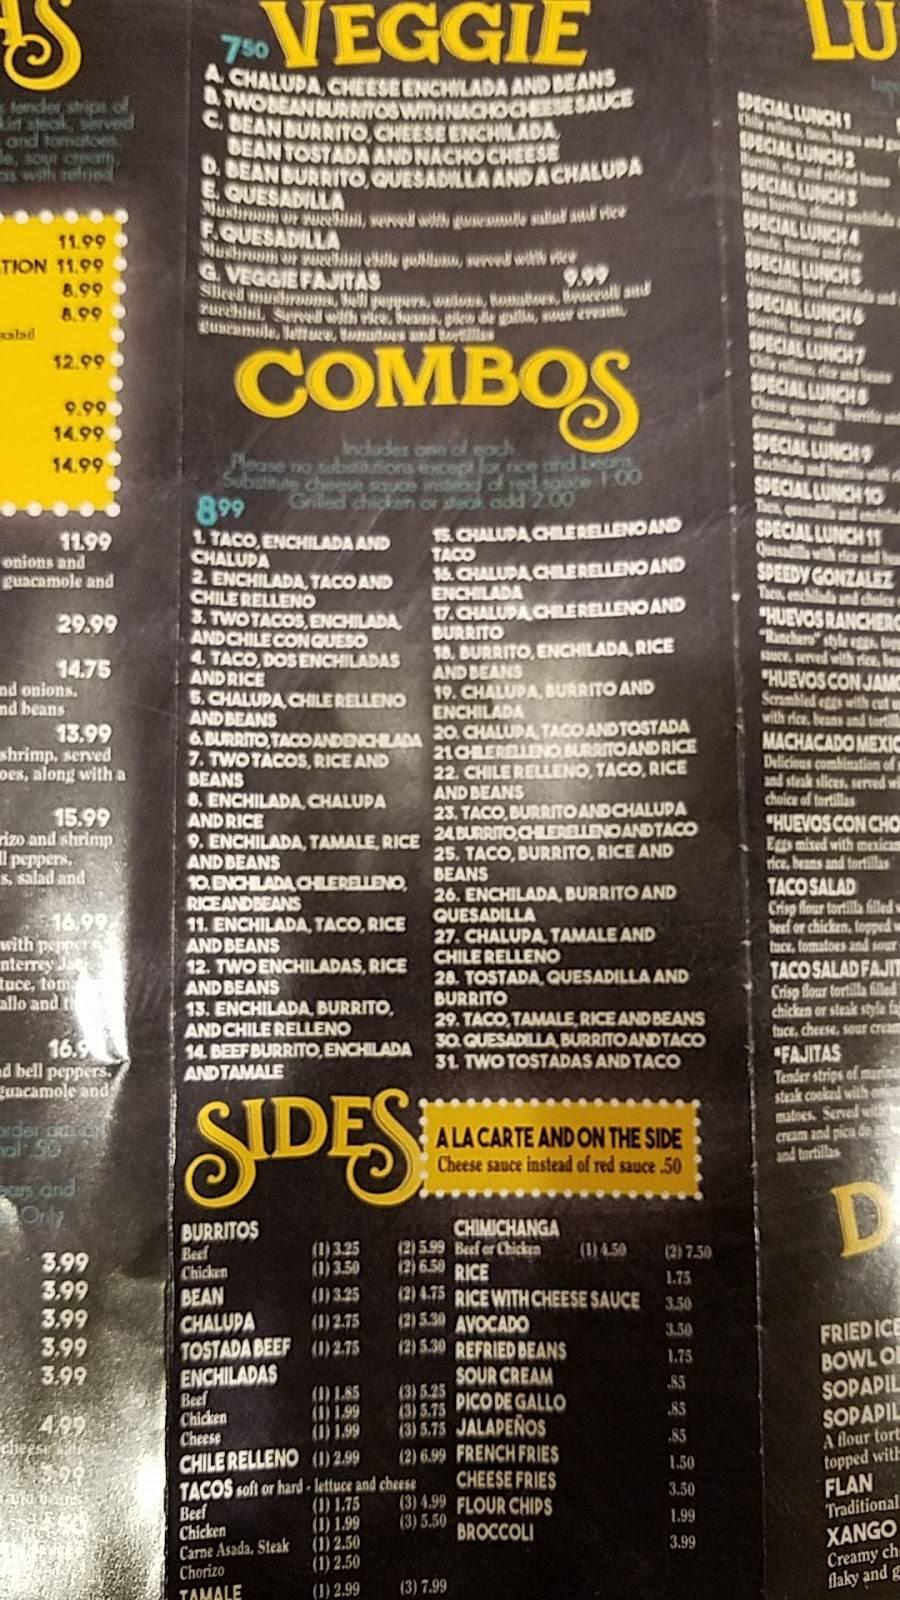 Los Charros | restaurant | 116 W Market St, Havana, IL 62644, USA | 3096400018 OR +1 309-640-0018